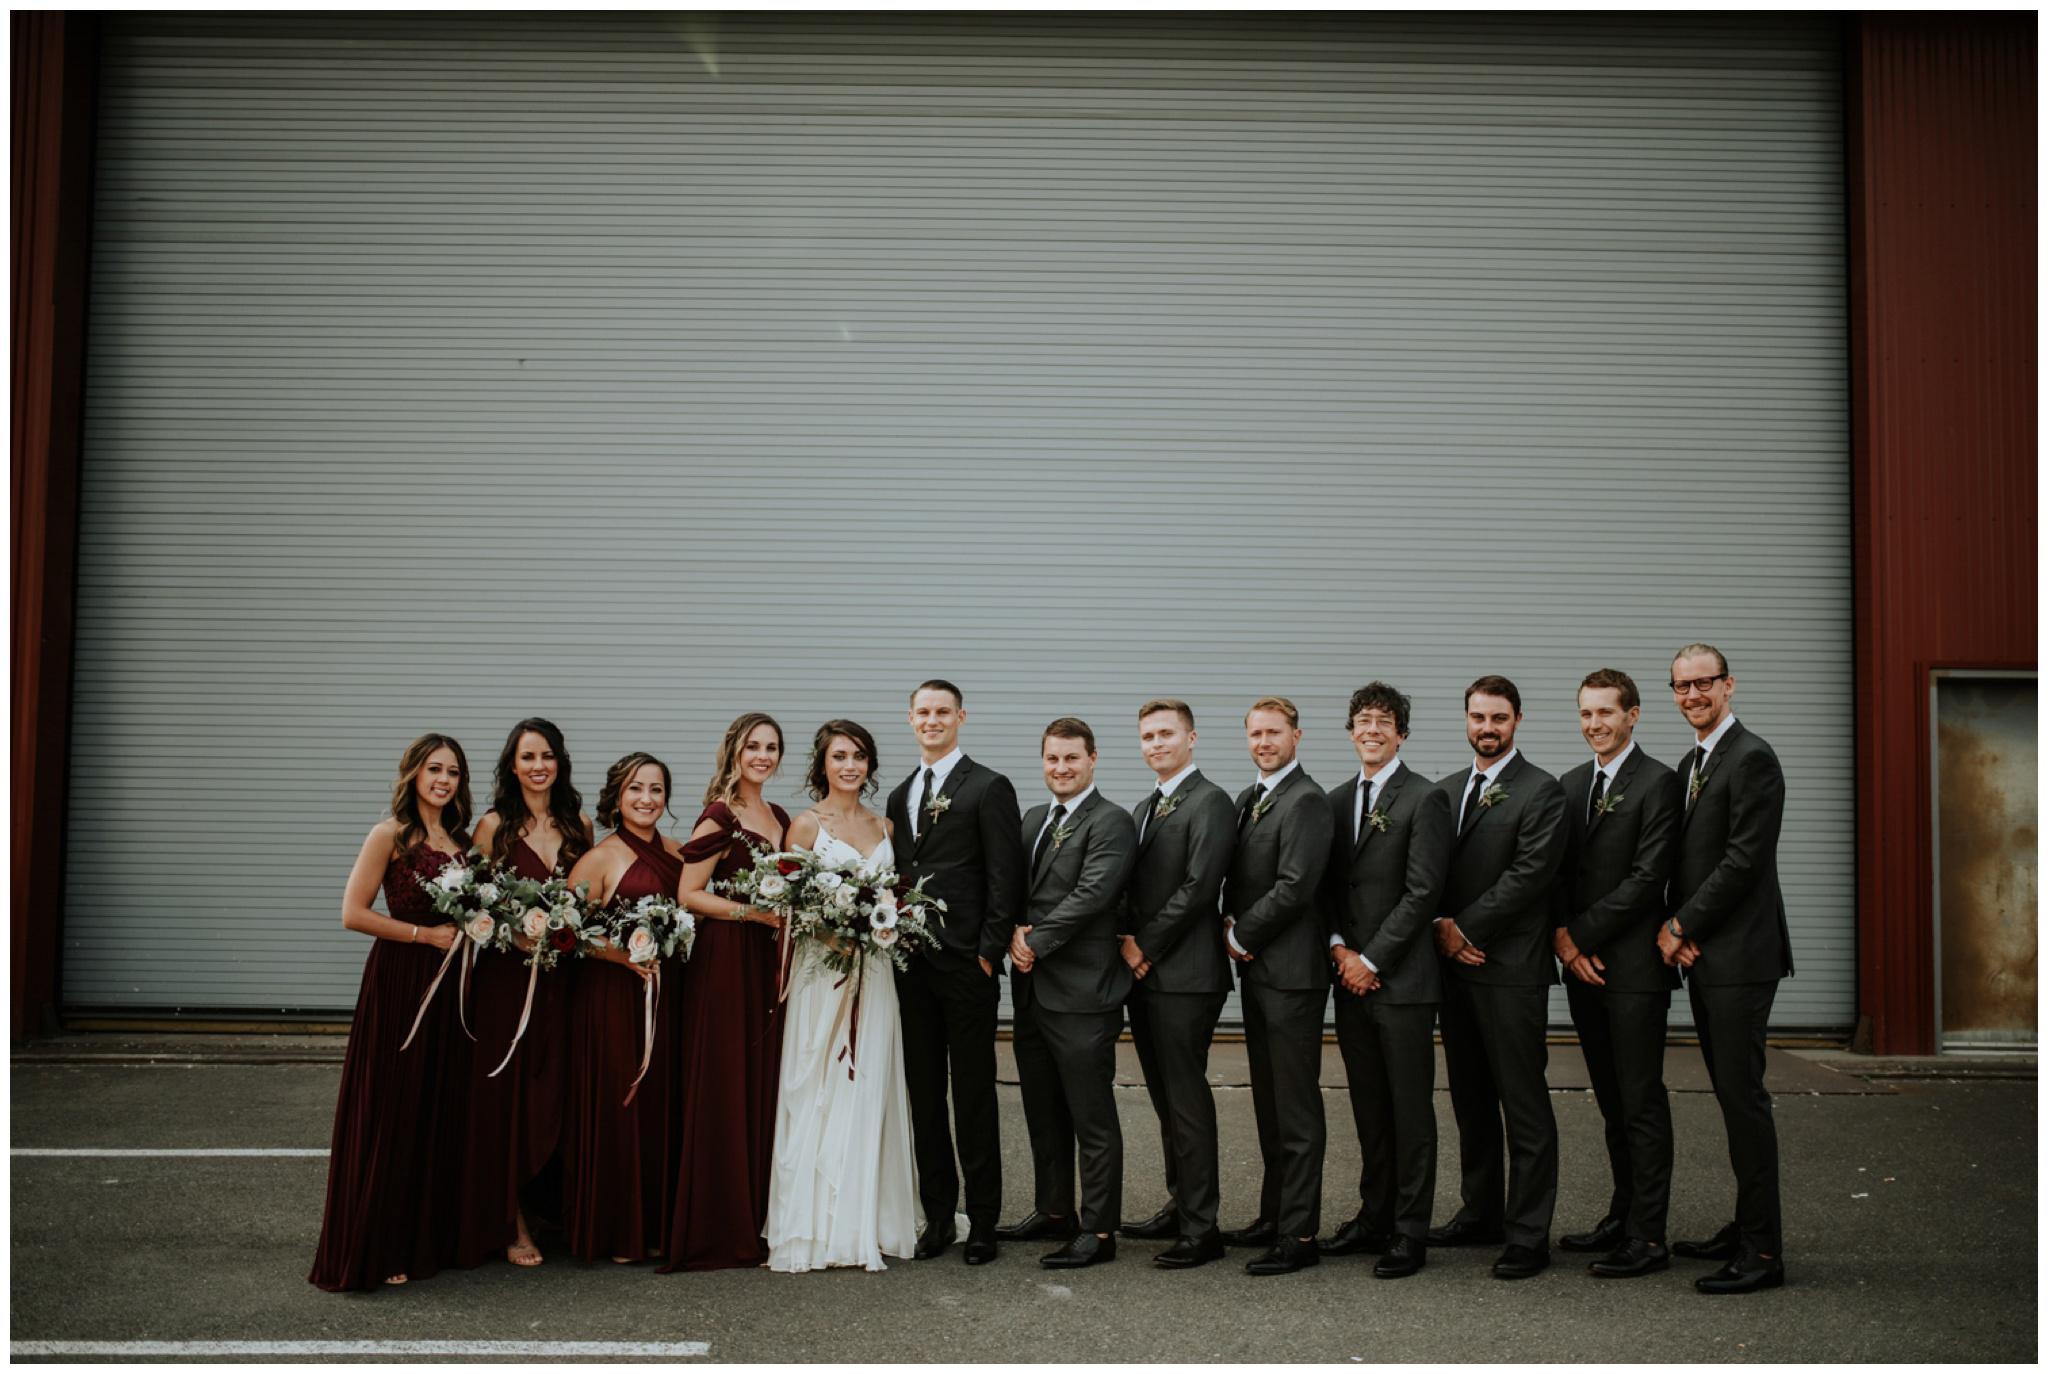 alyssa-keiran-westland-distillery-urban-seattle-wedding-photographer-caitlyn-nikula-79.jpg